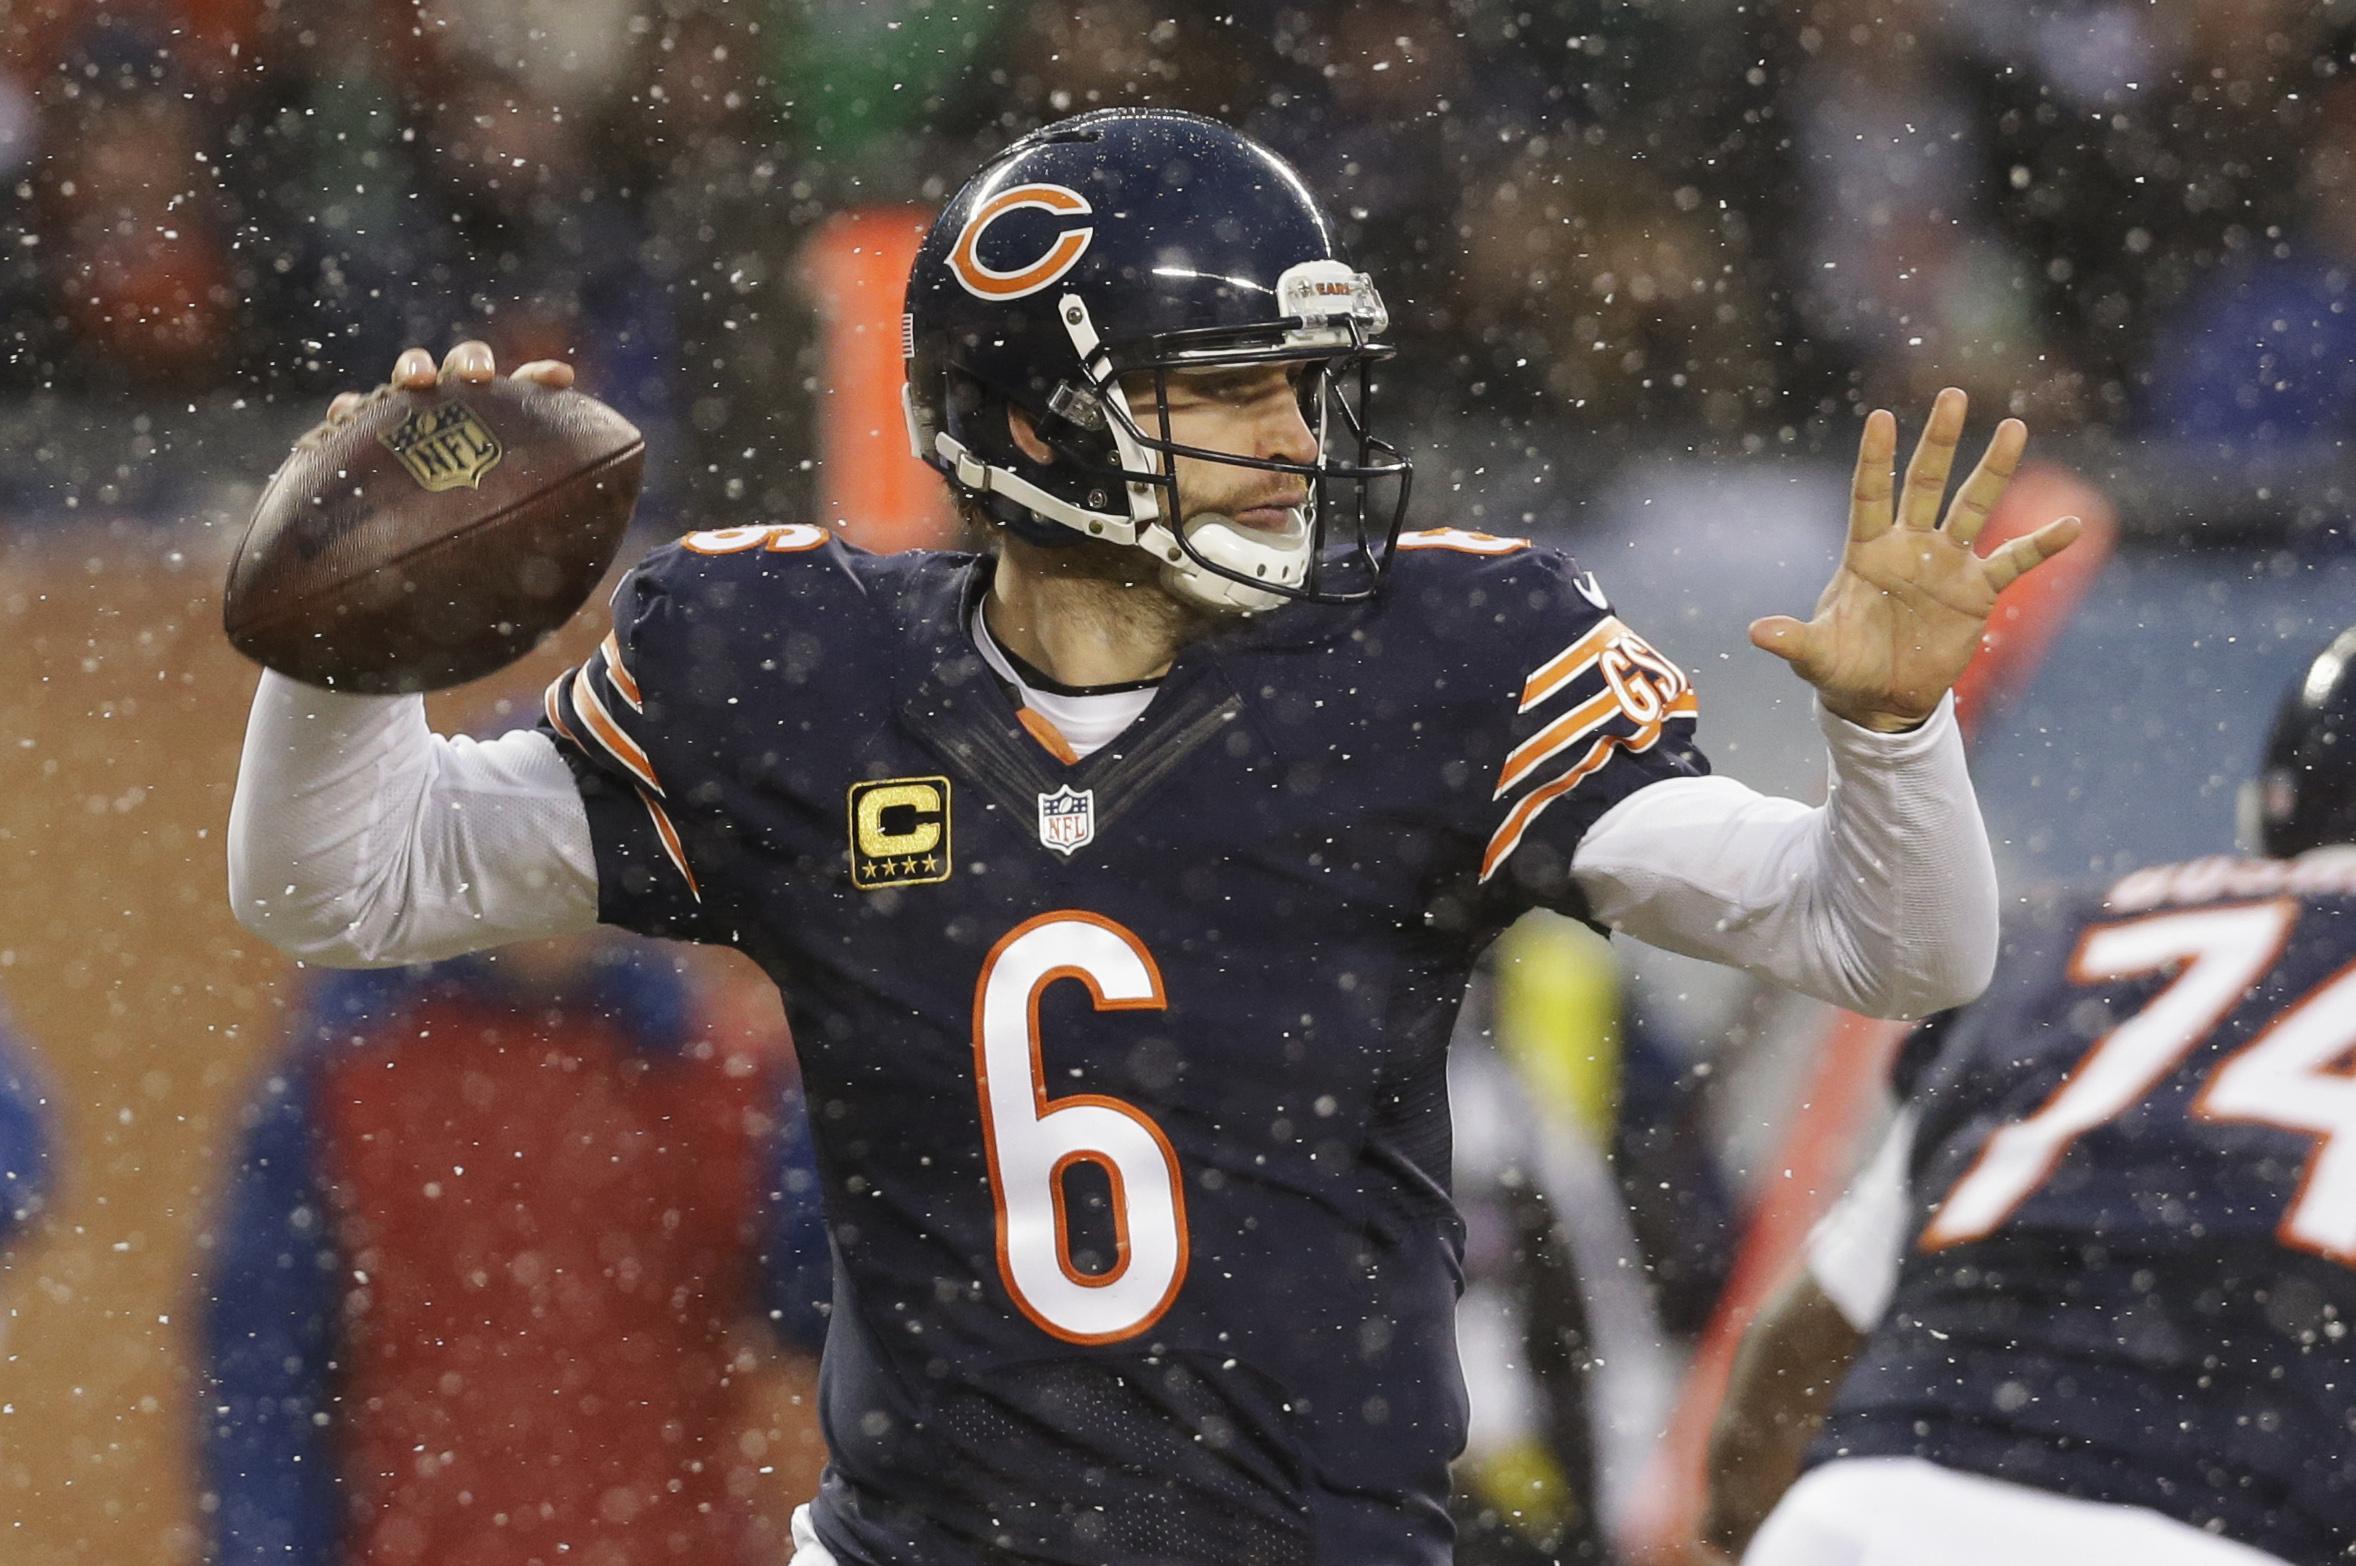 Bears sign QB Jay Cutler to 7-year deal